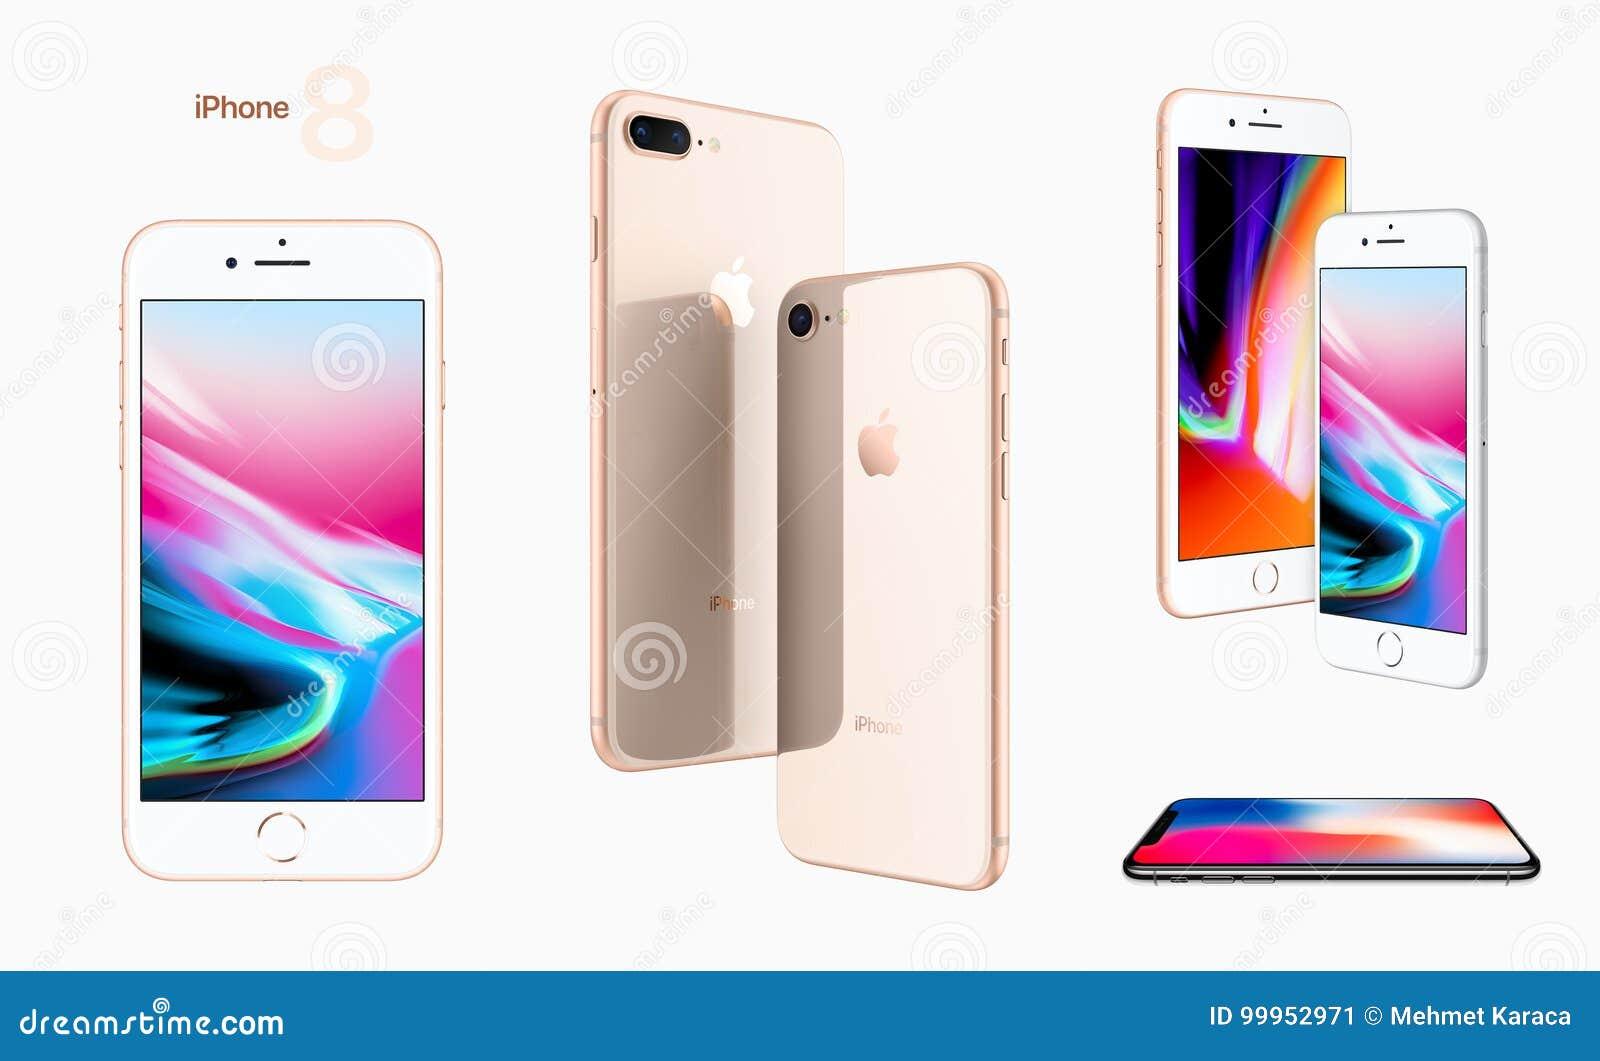 iPhone 8 Apple 2017